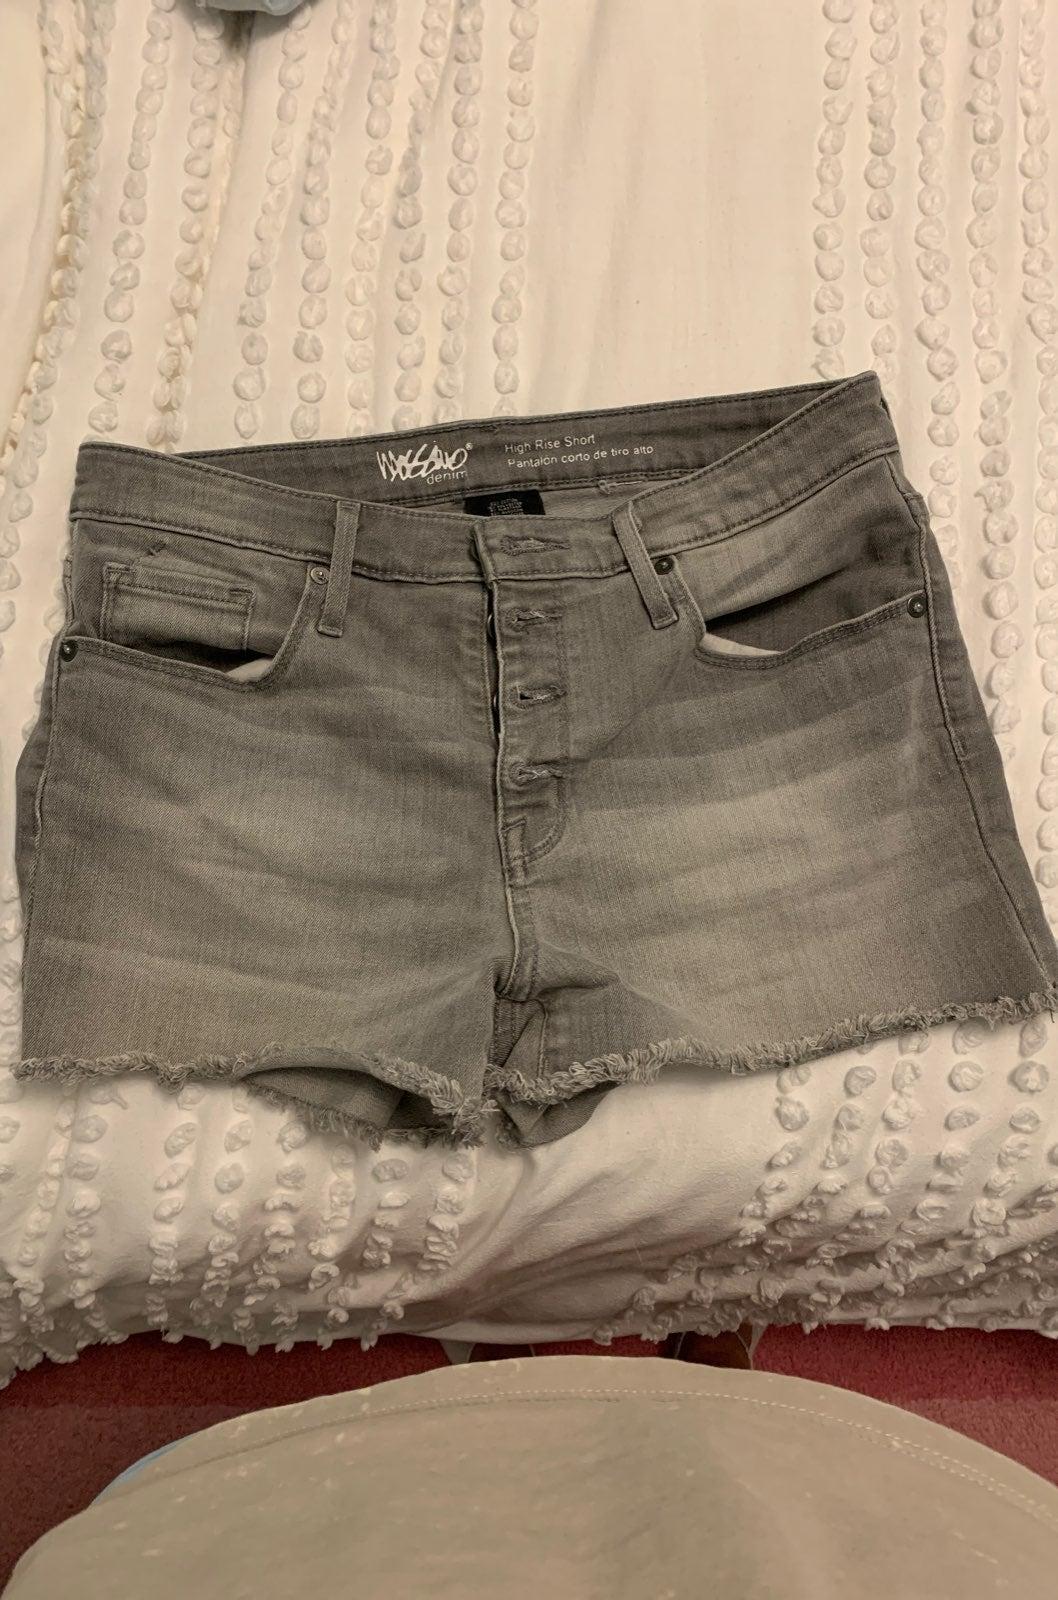 mossimo womens jean shorts